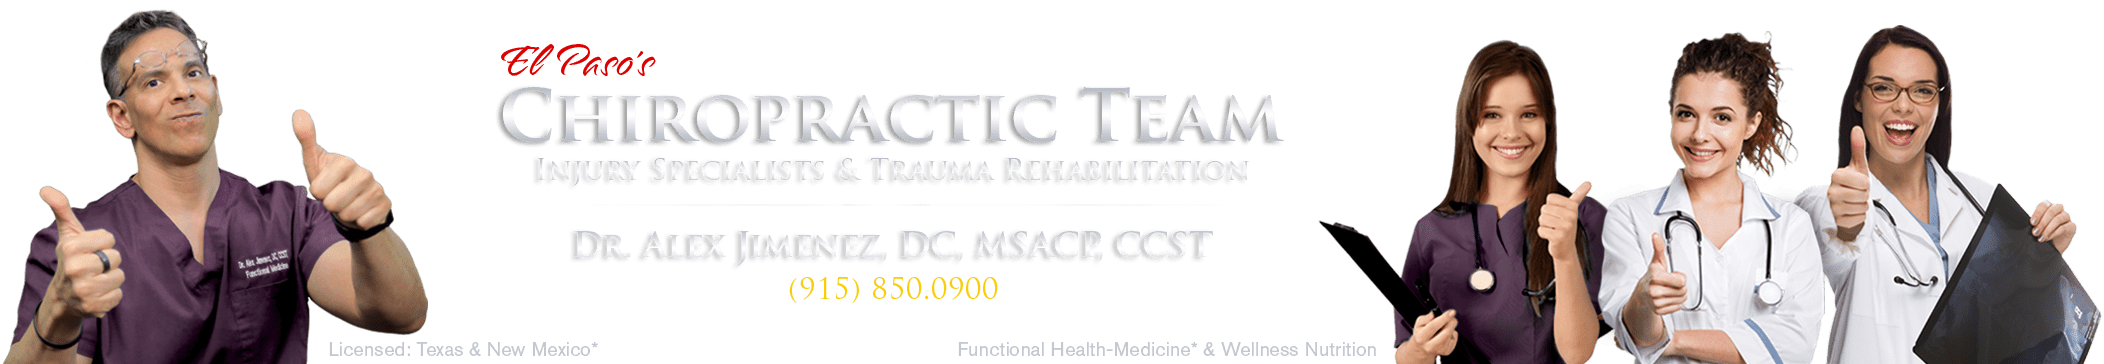 Premier klinika za kiropraktiku u El Pasu 915-850-0900